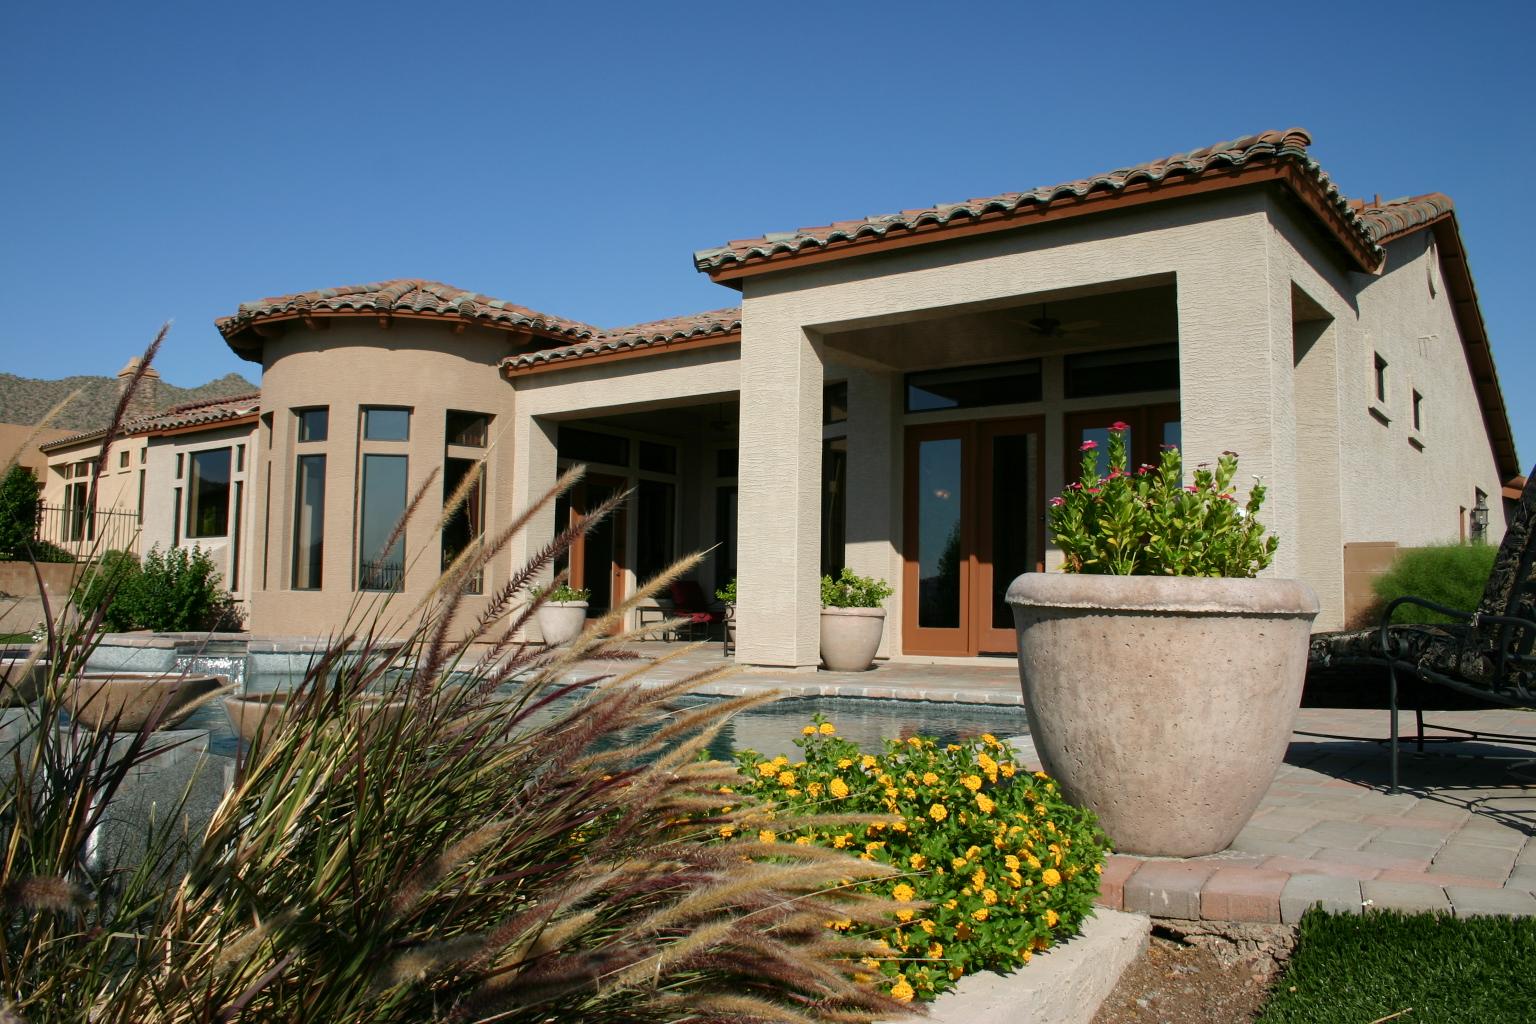 Las Sendas Homes For Sale View All Available Las Sendas